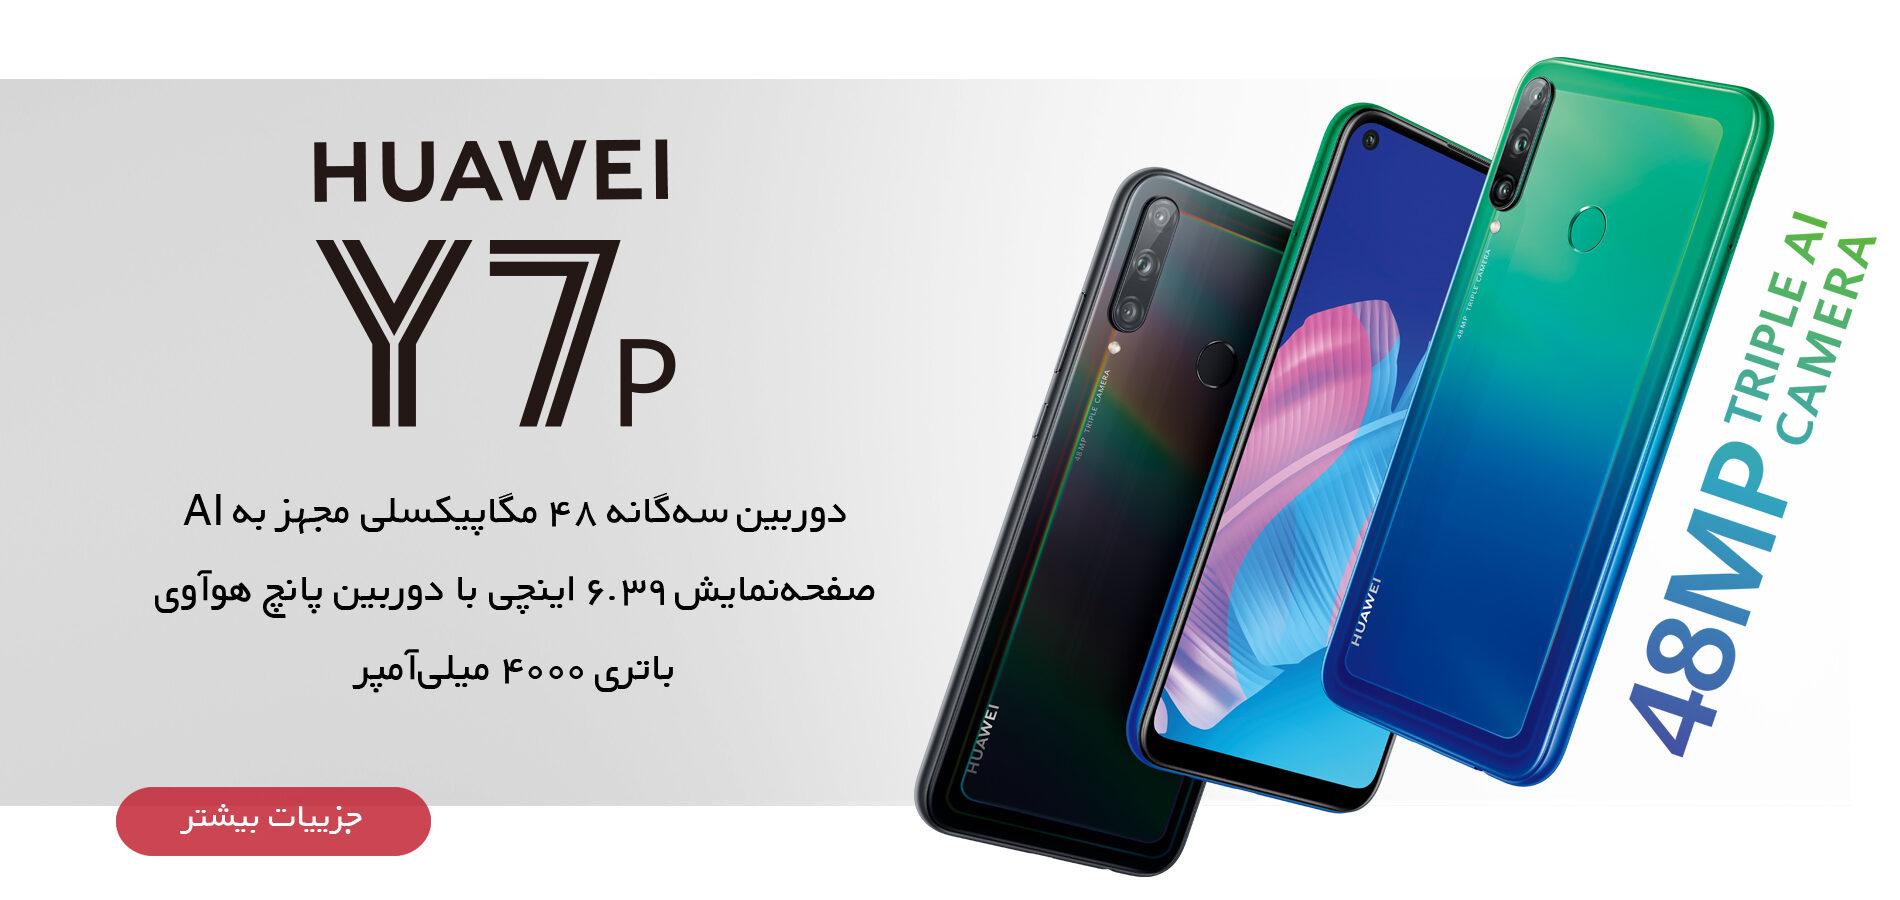 Huawei Mobile Farsi | هوآوی موبایل فارسی